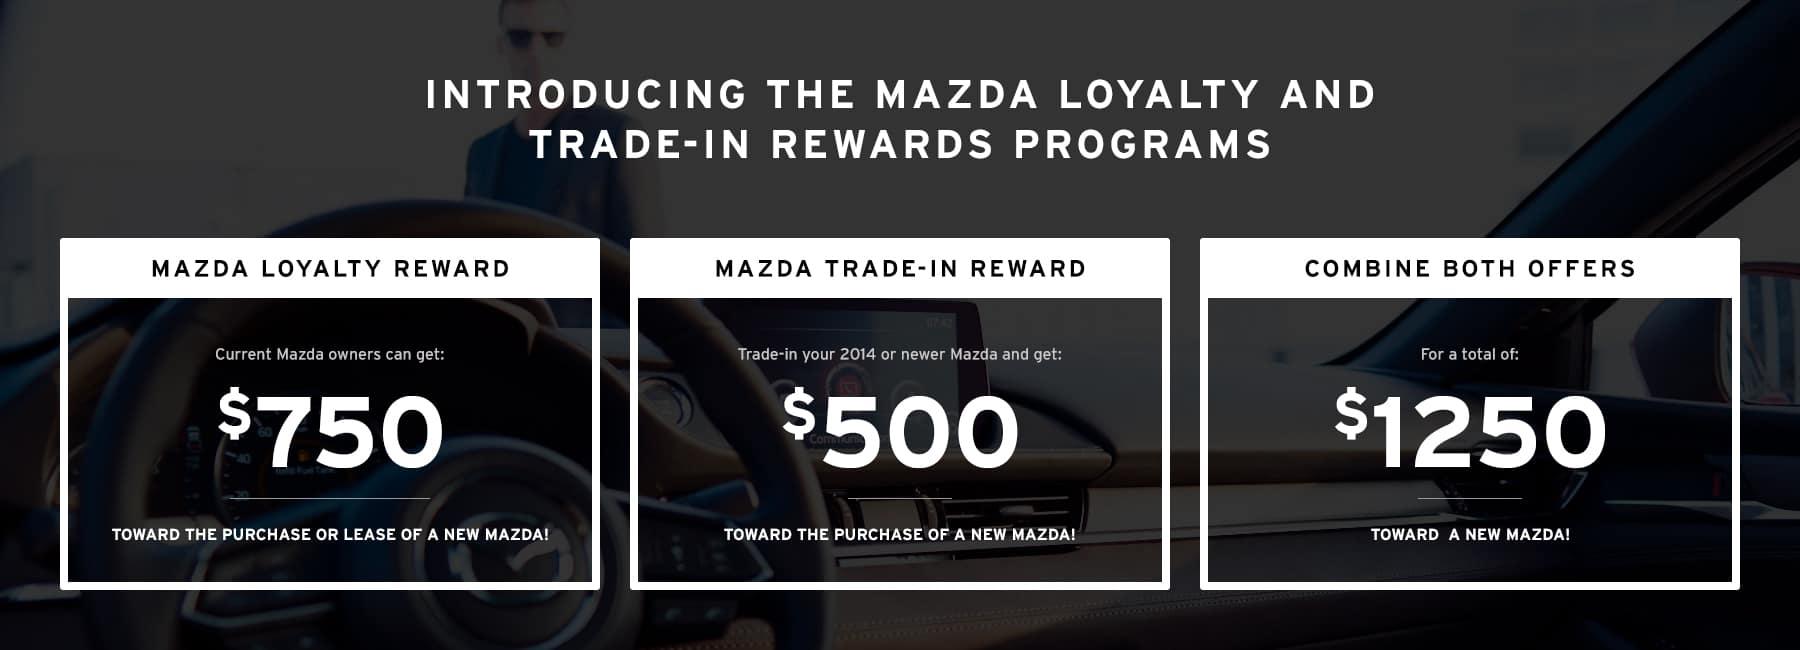 Mazda Loyalty and Trade-in Reward Programs